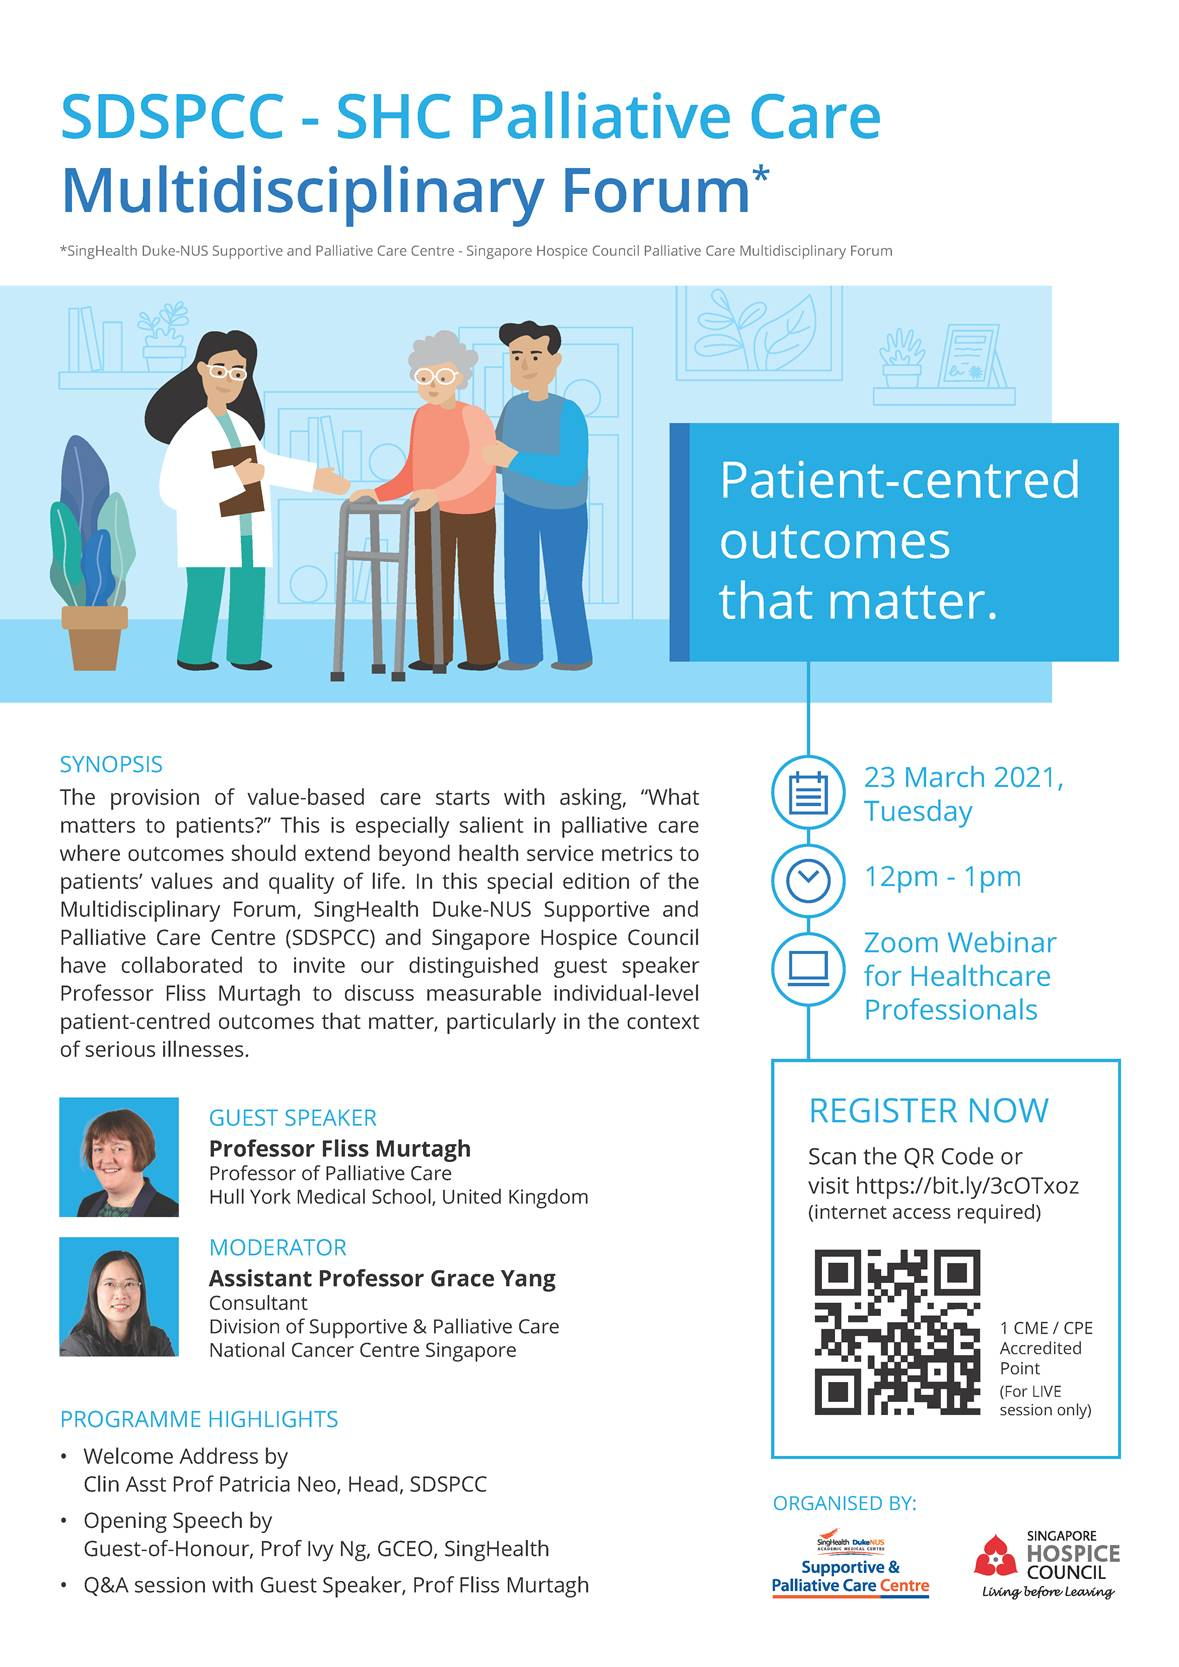 SDSPCC – SHC Palliative Care Multidisciplinary Forum